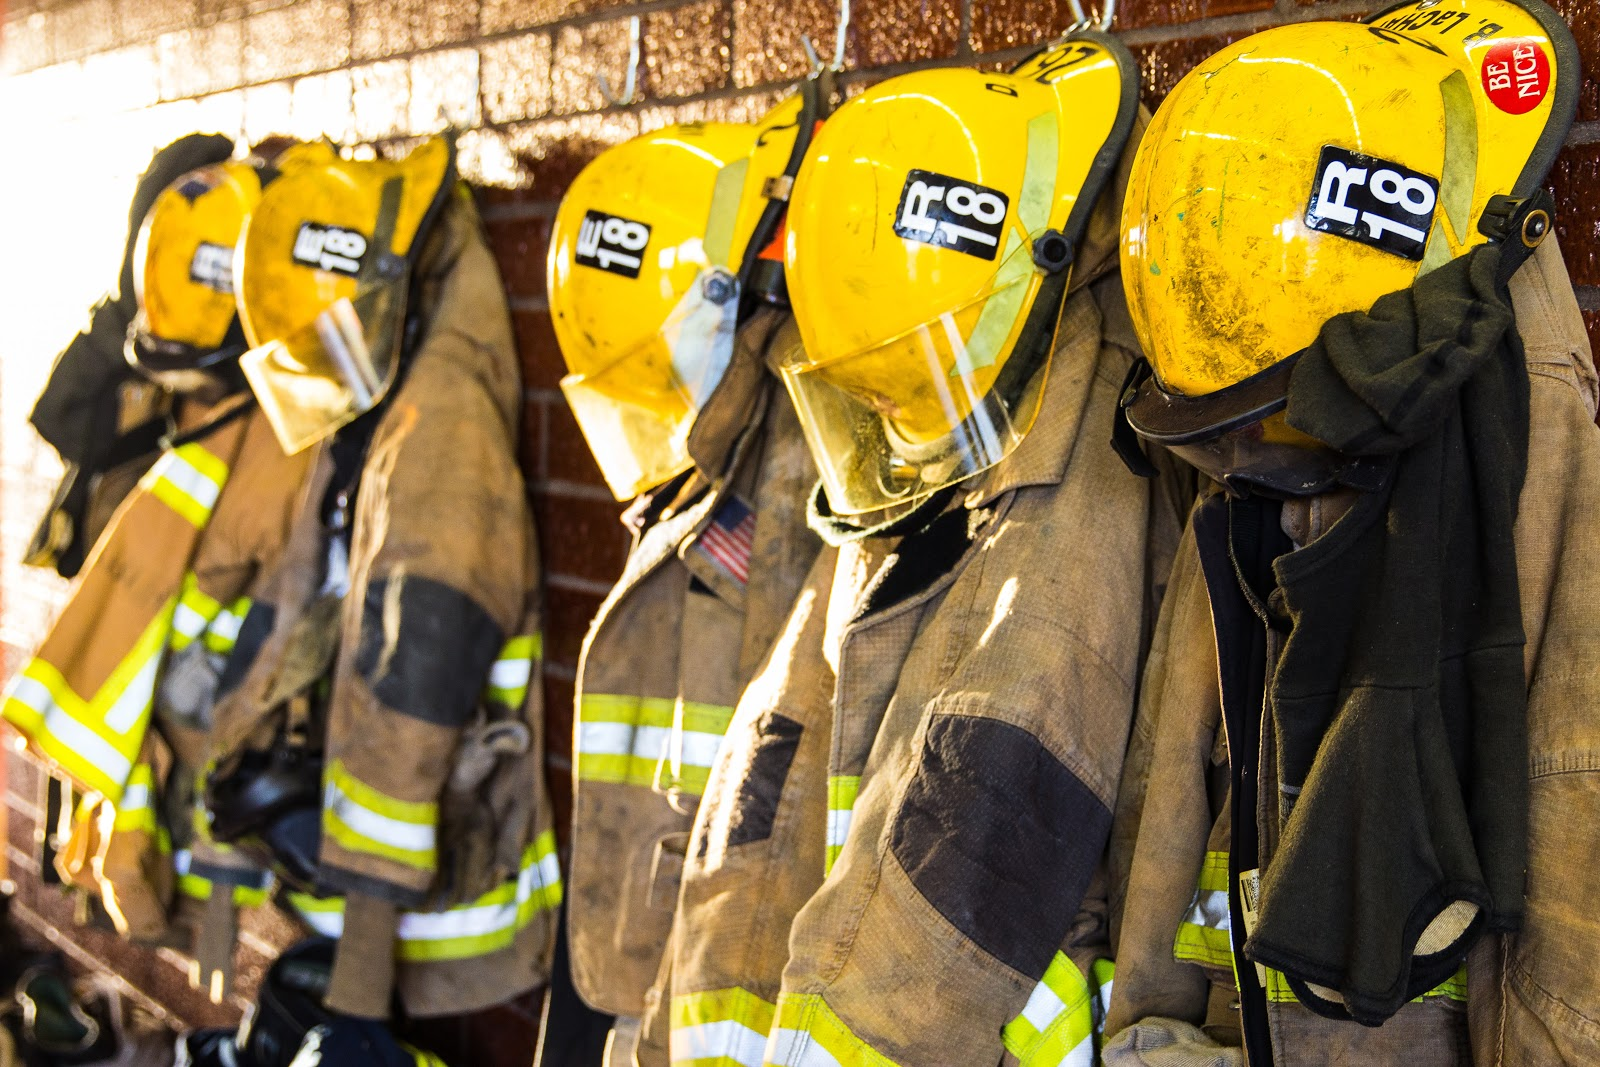 a row of yellow fireman uniforms